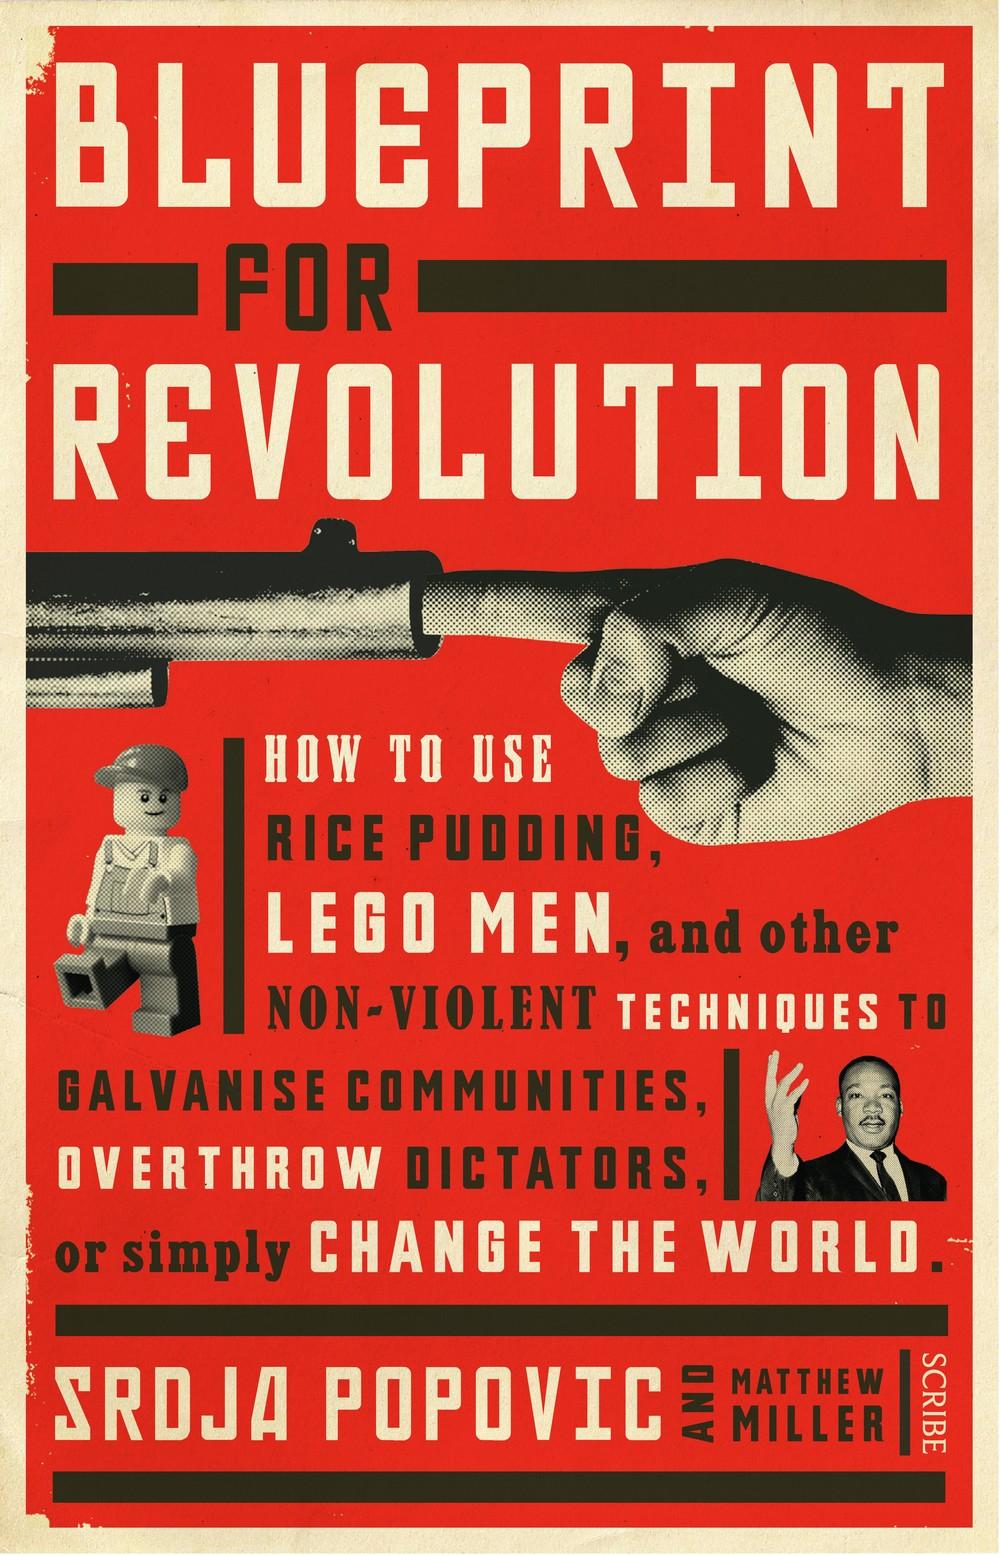 Blueprint for Revolution: Srdja Popovic. Image Amazon UK